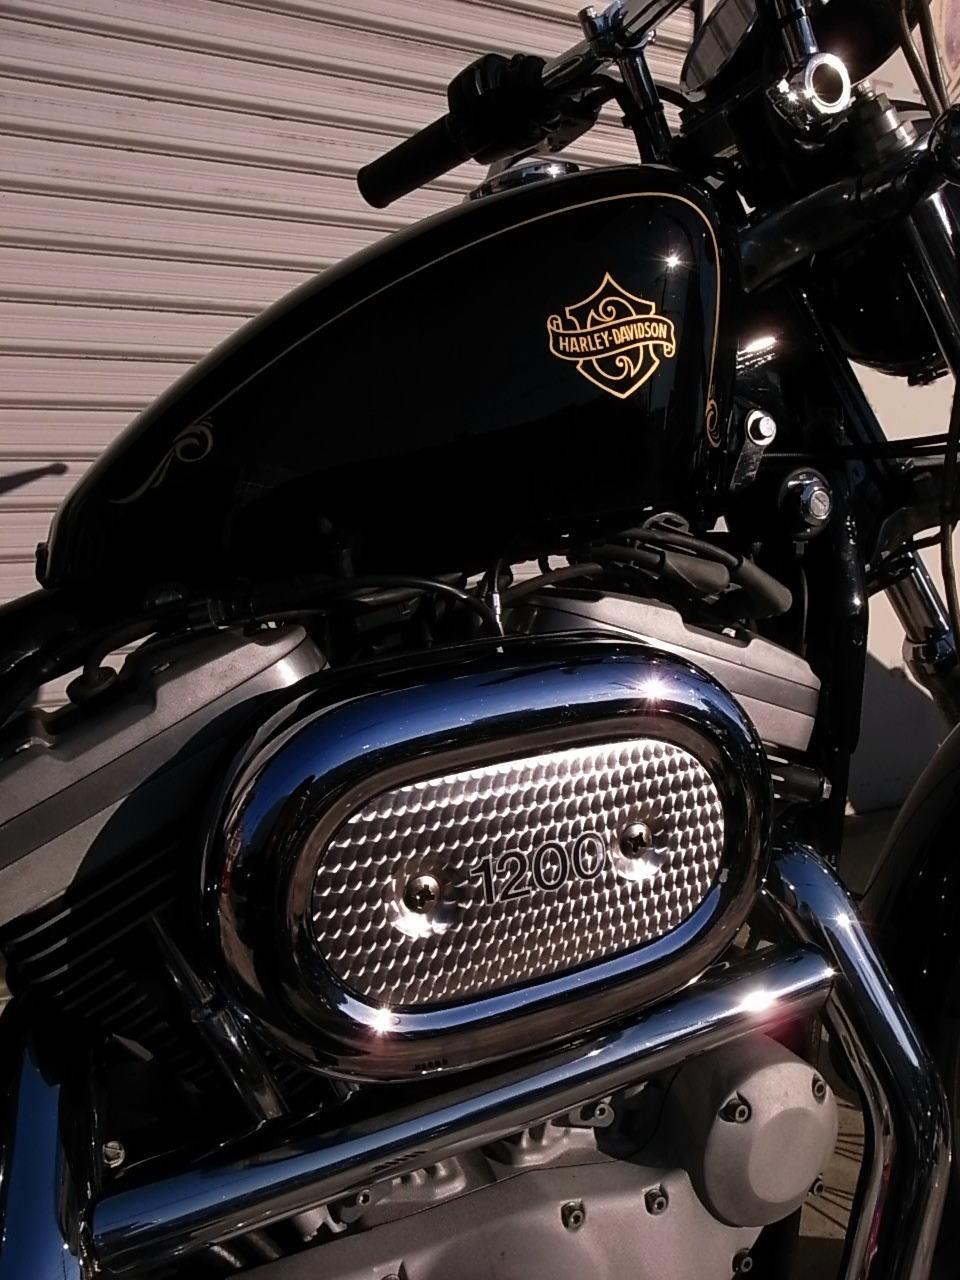 Harley Davidson XL1200S_b0160319_13275141.jpg